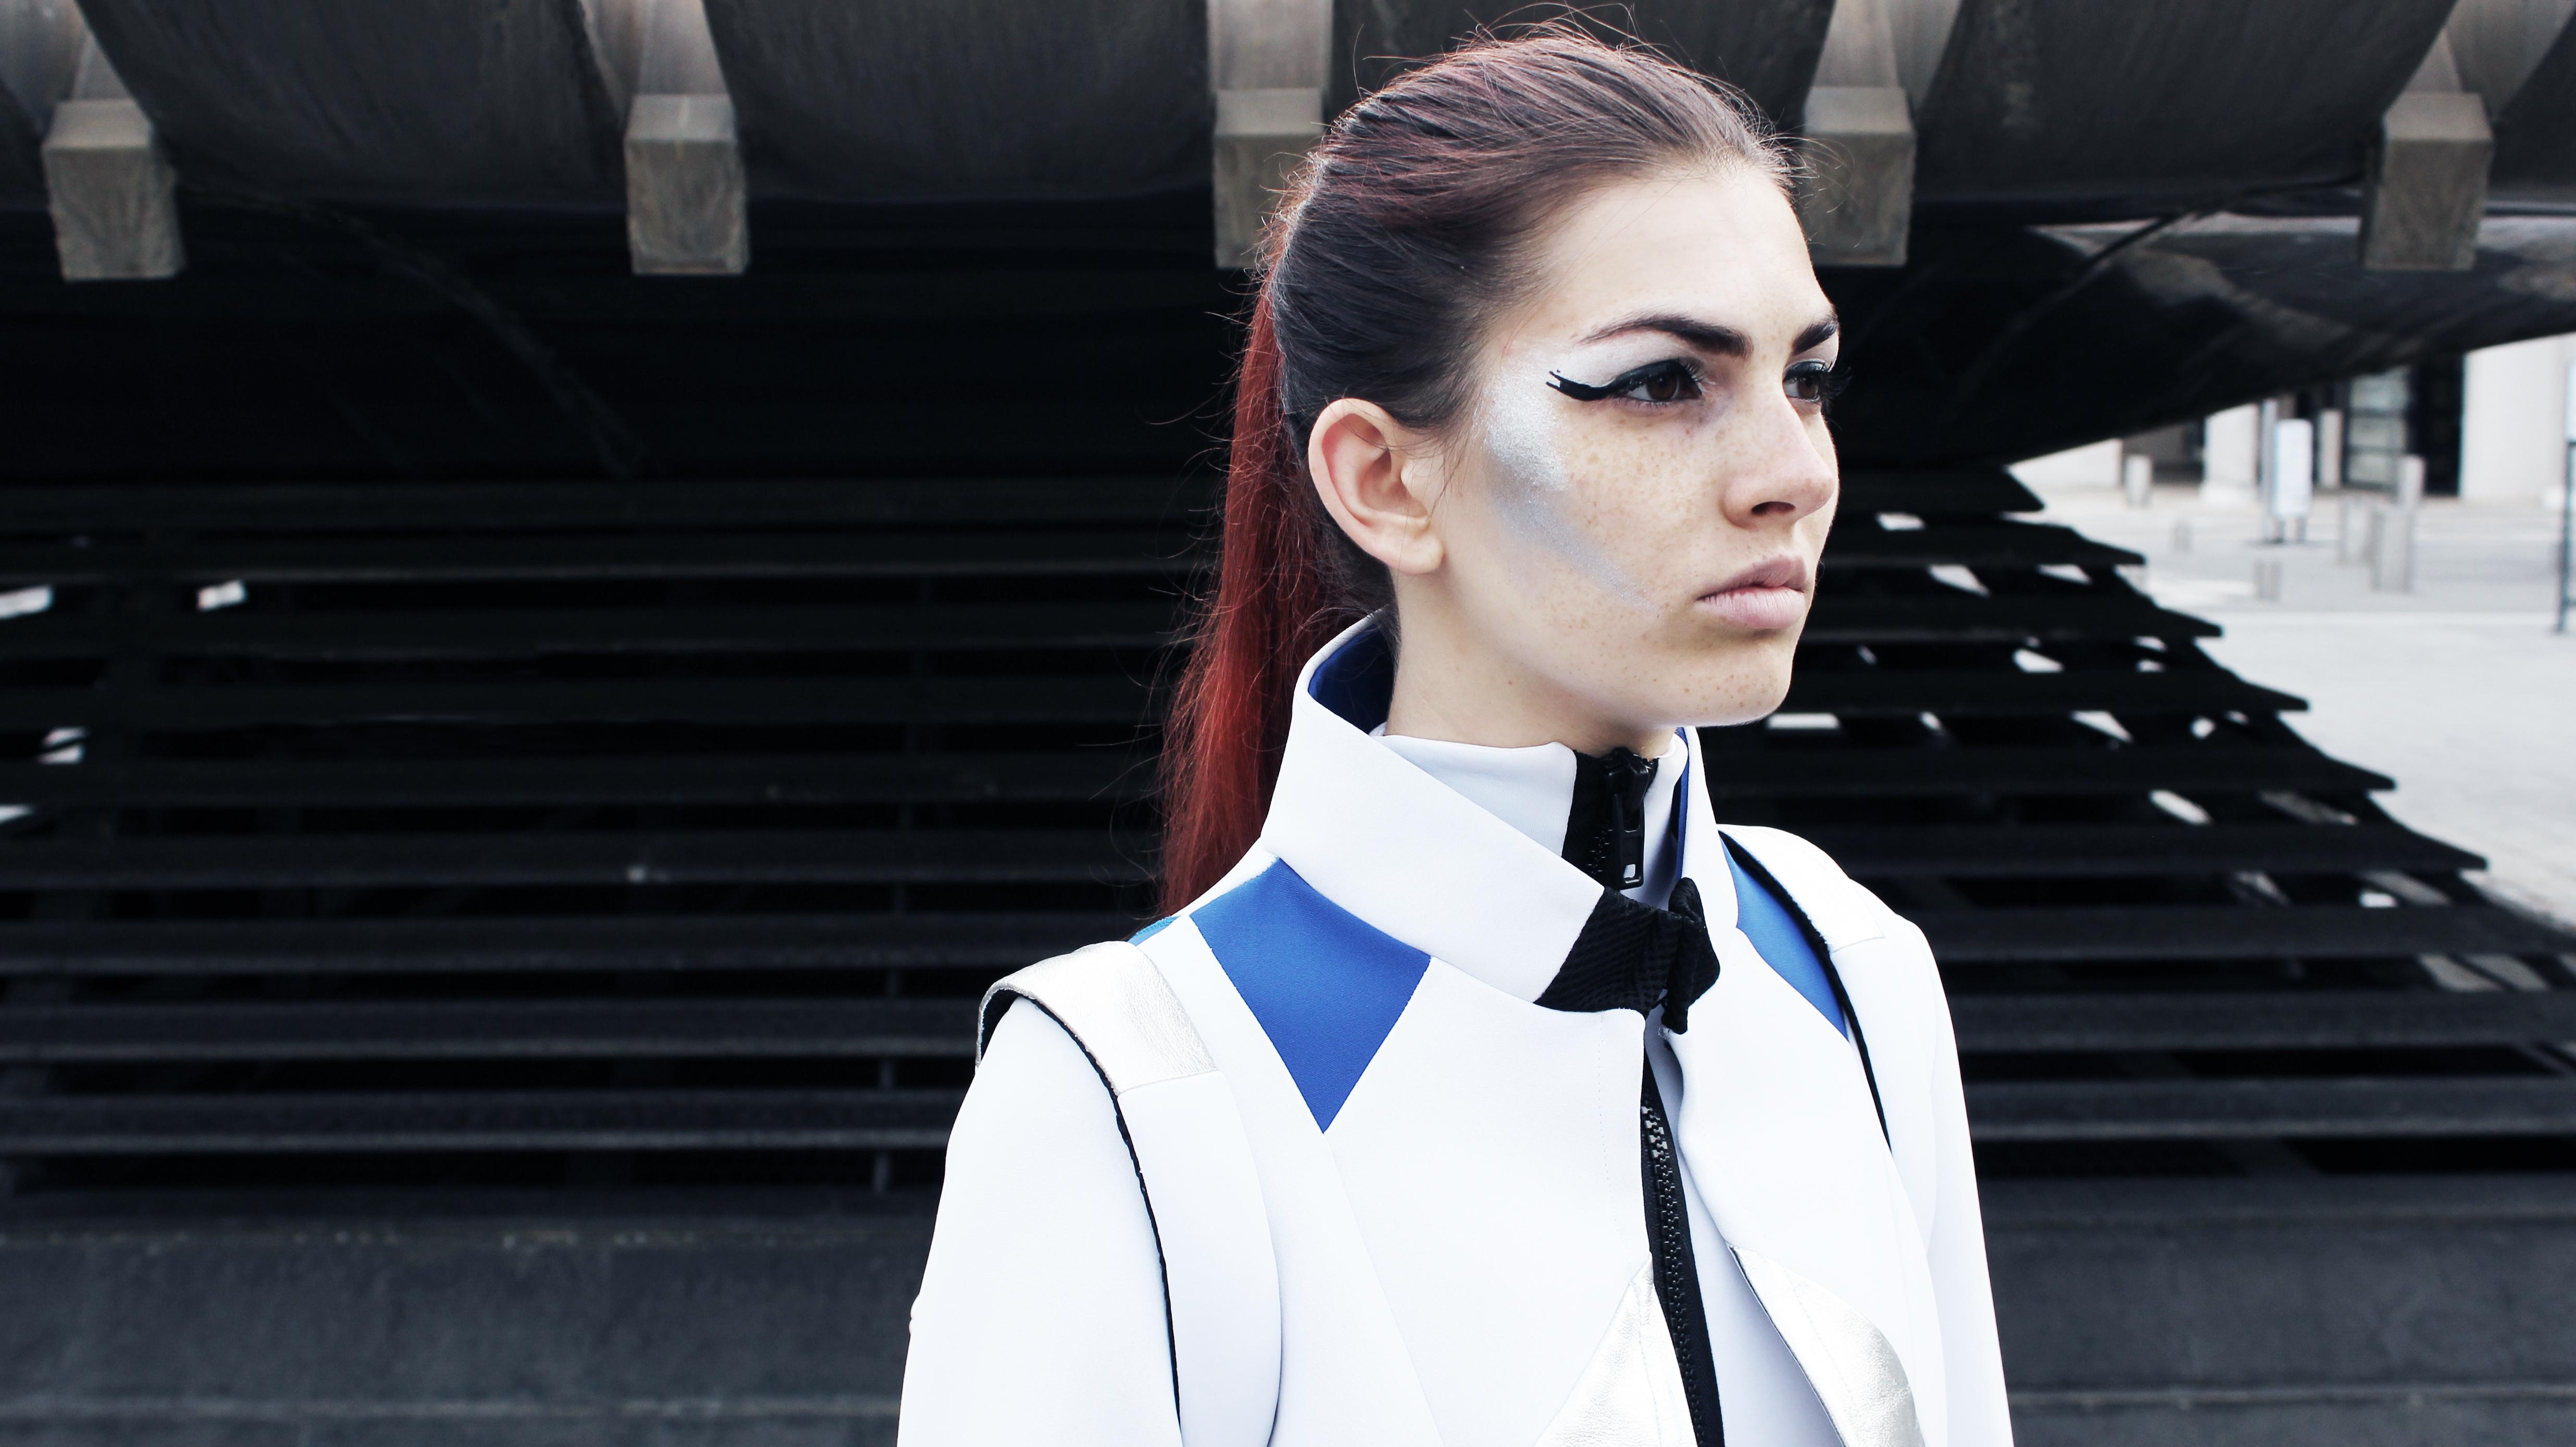 Marine Arnoul x Martian Agency